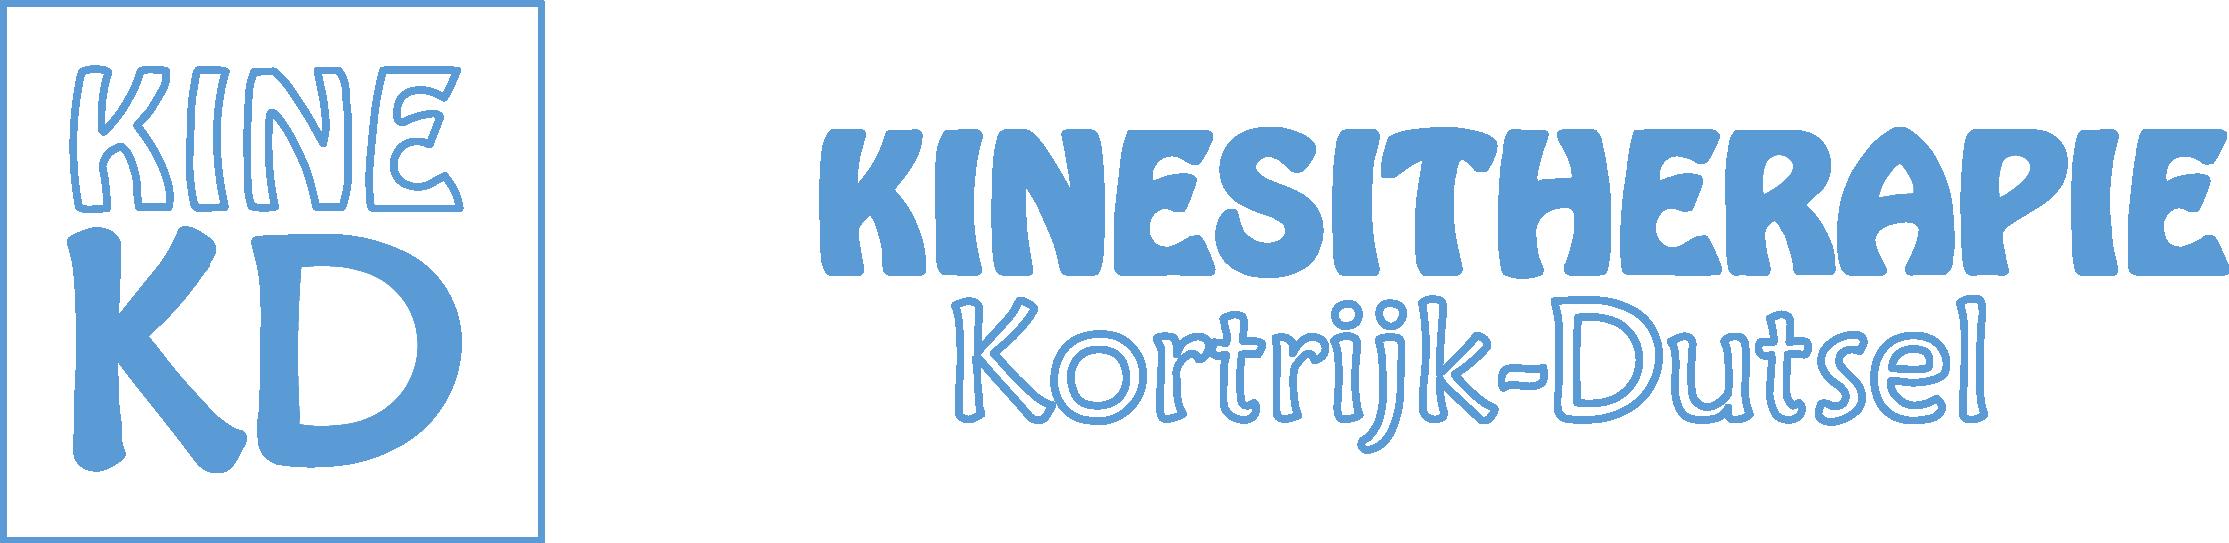 keuze logo